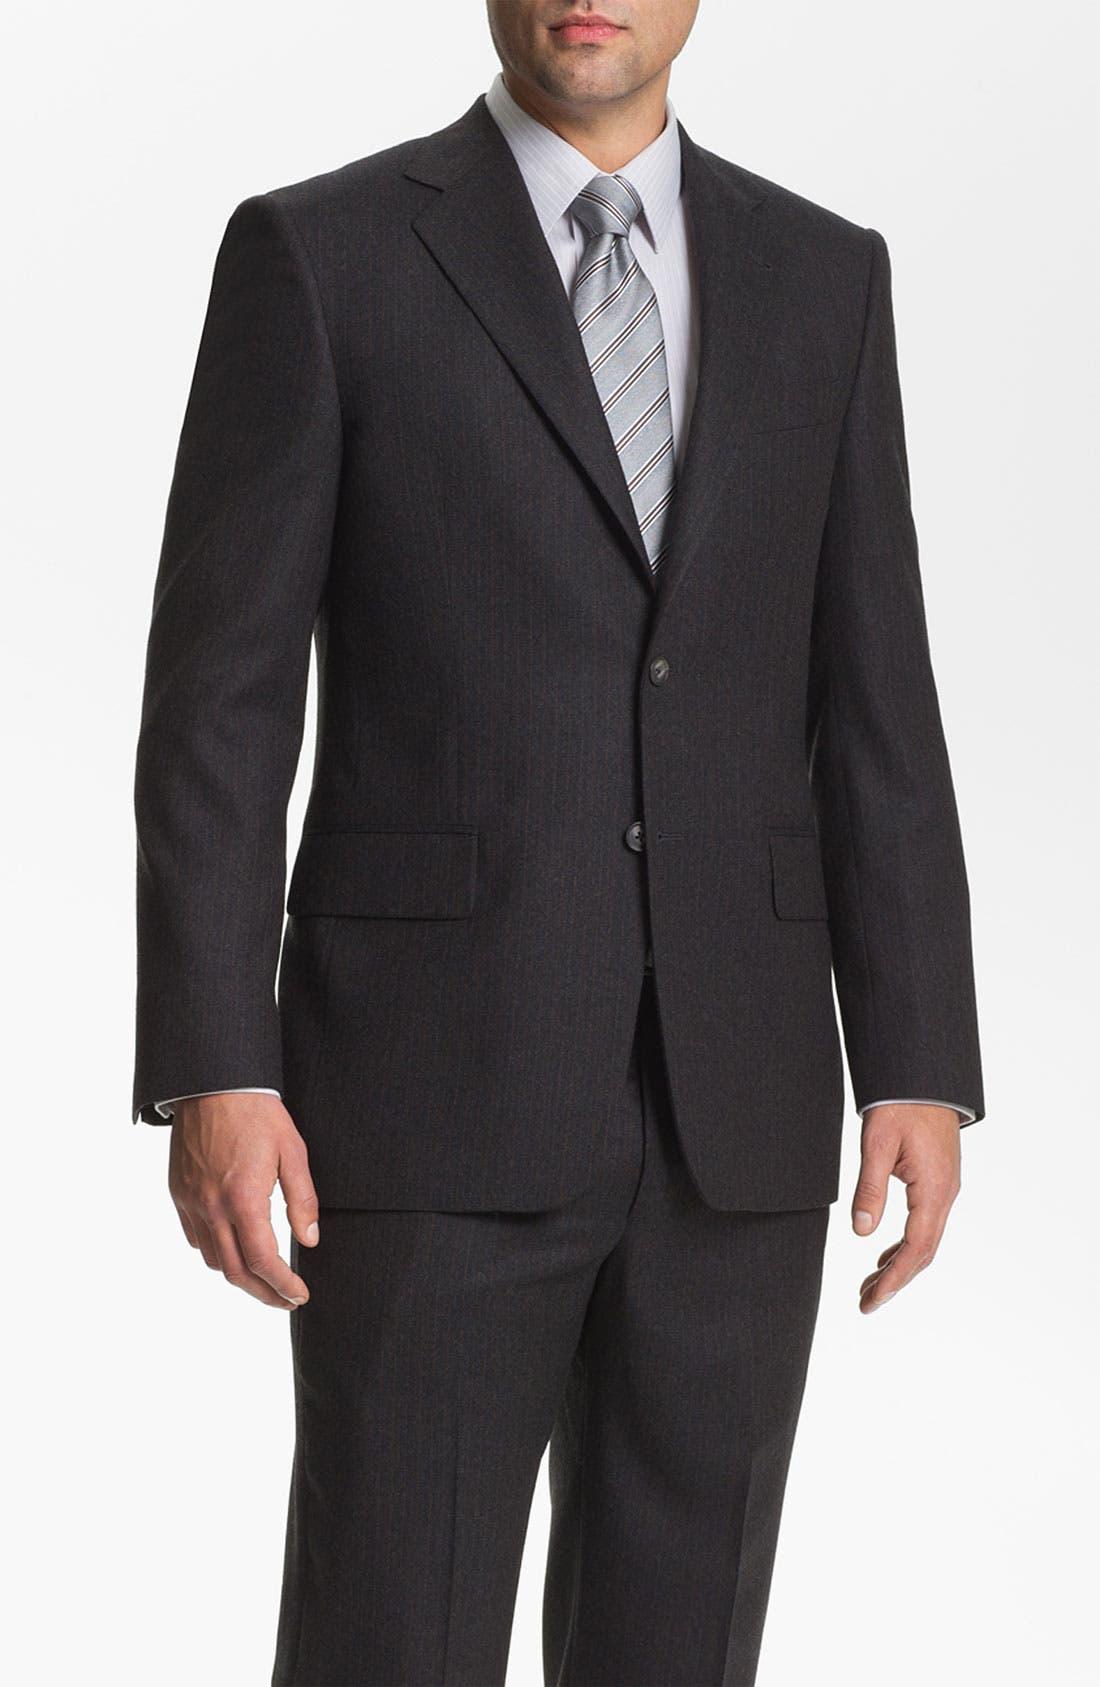 Main Image - Joseph Abboud 'Signature Silver' Stripe Suit